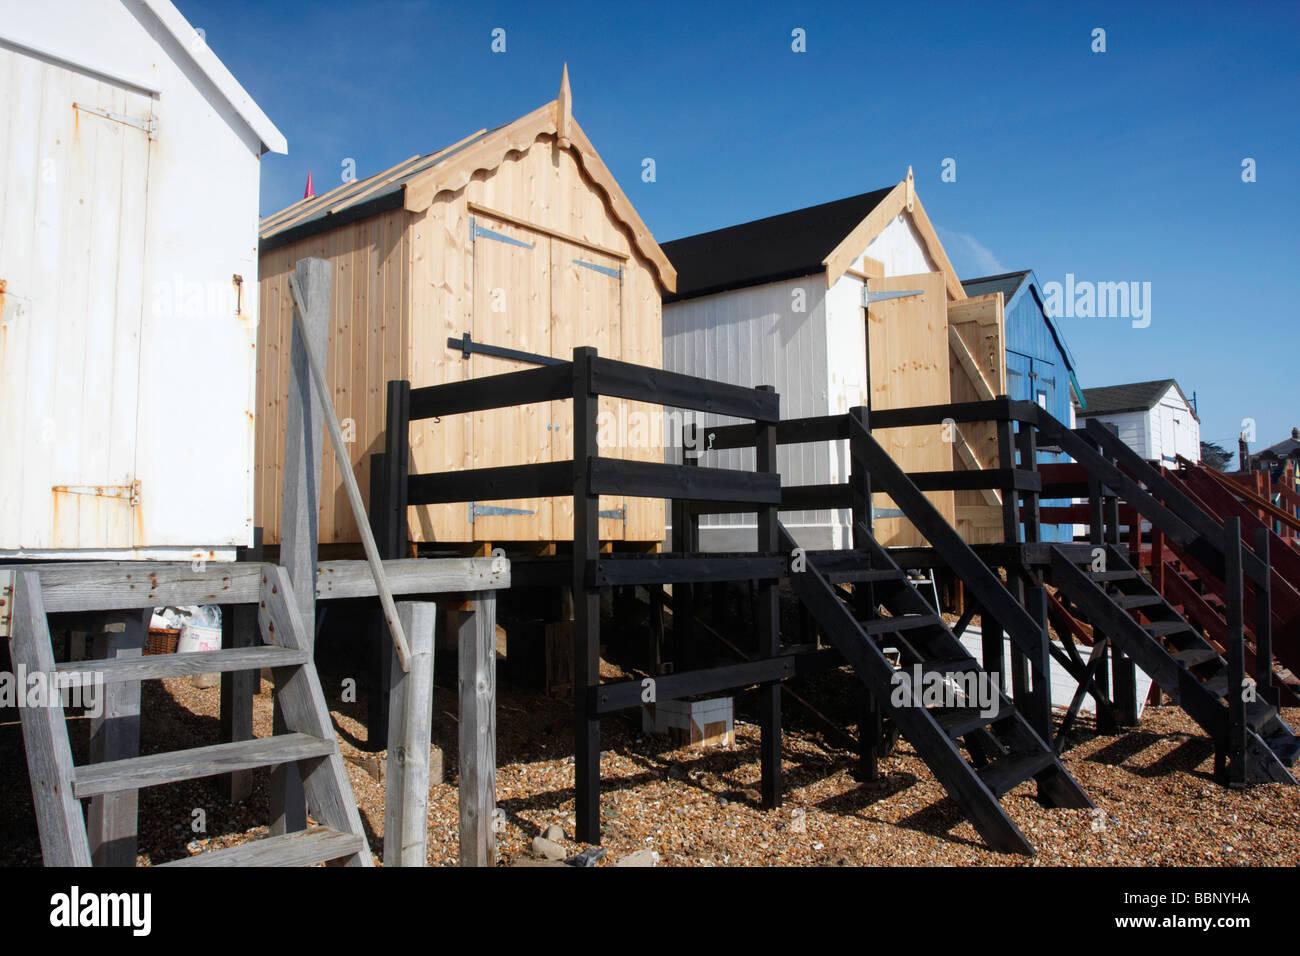 Beach huts at Felixstowe on the Suffolk Coast - Stock Image